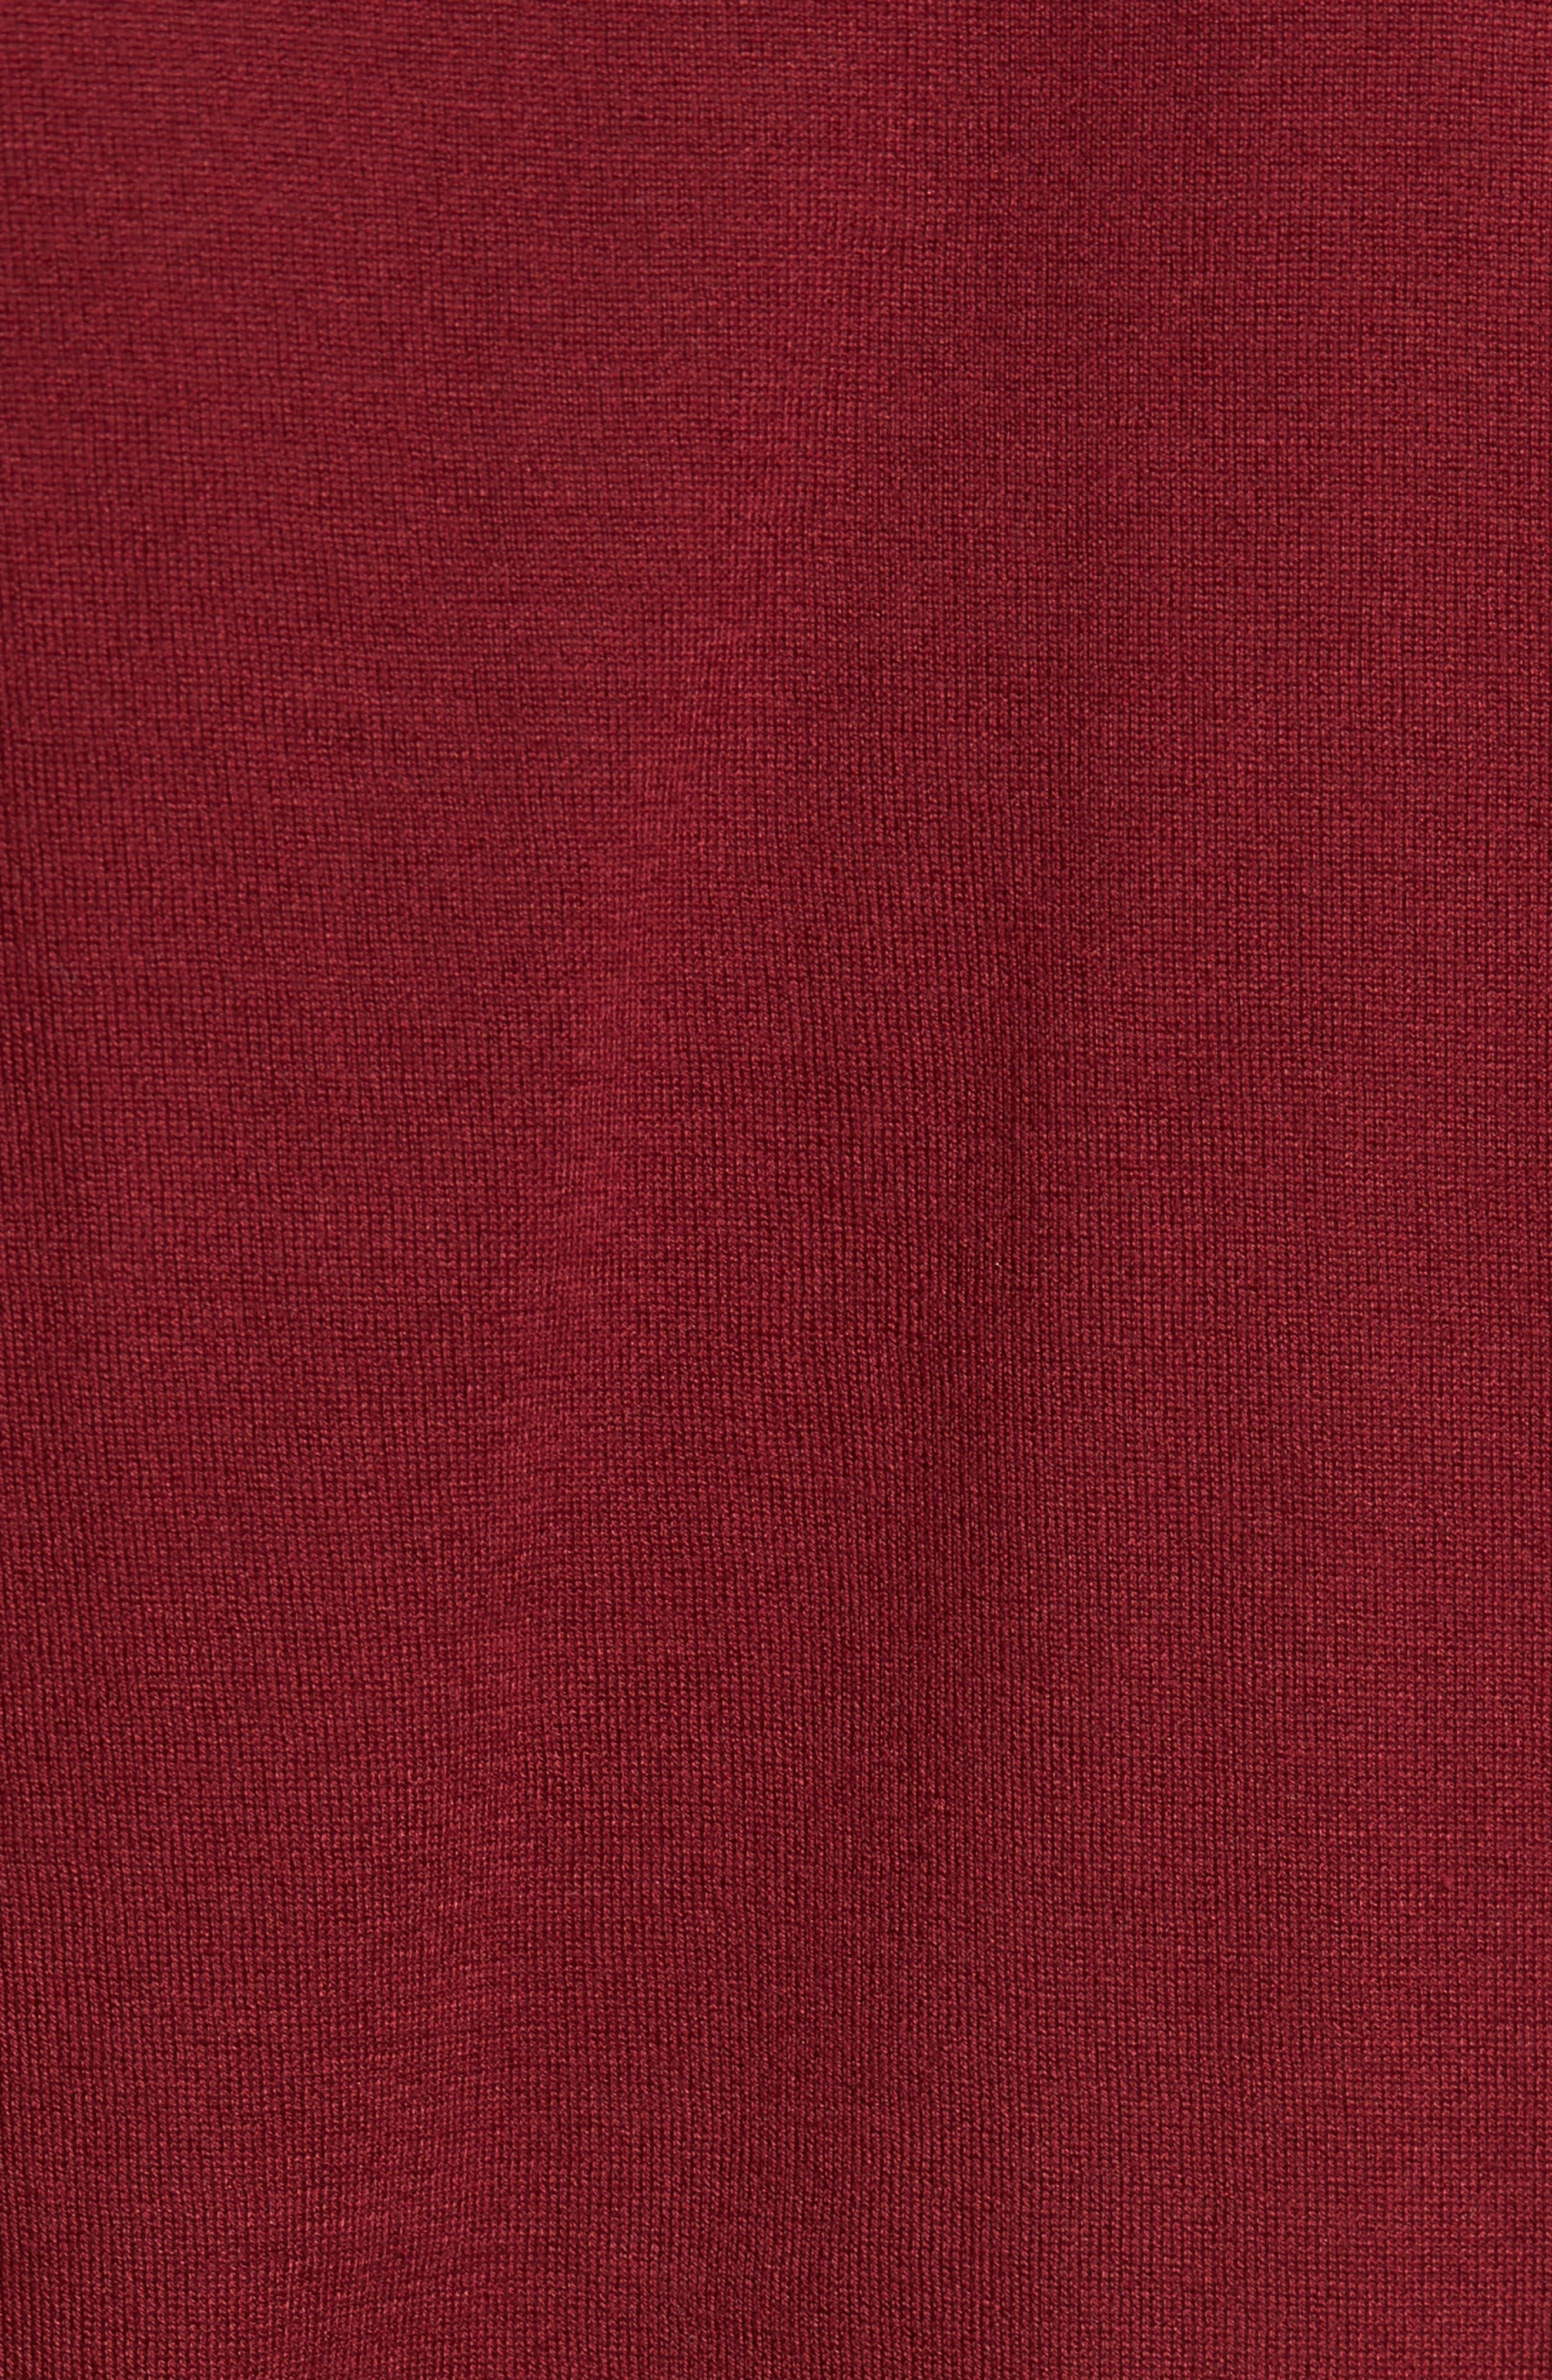 Jersey Polo,                             Alternate thumbnail 5, color,                             Burgundy Grain